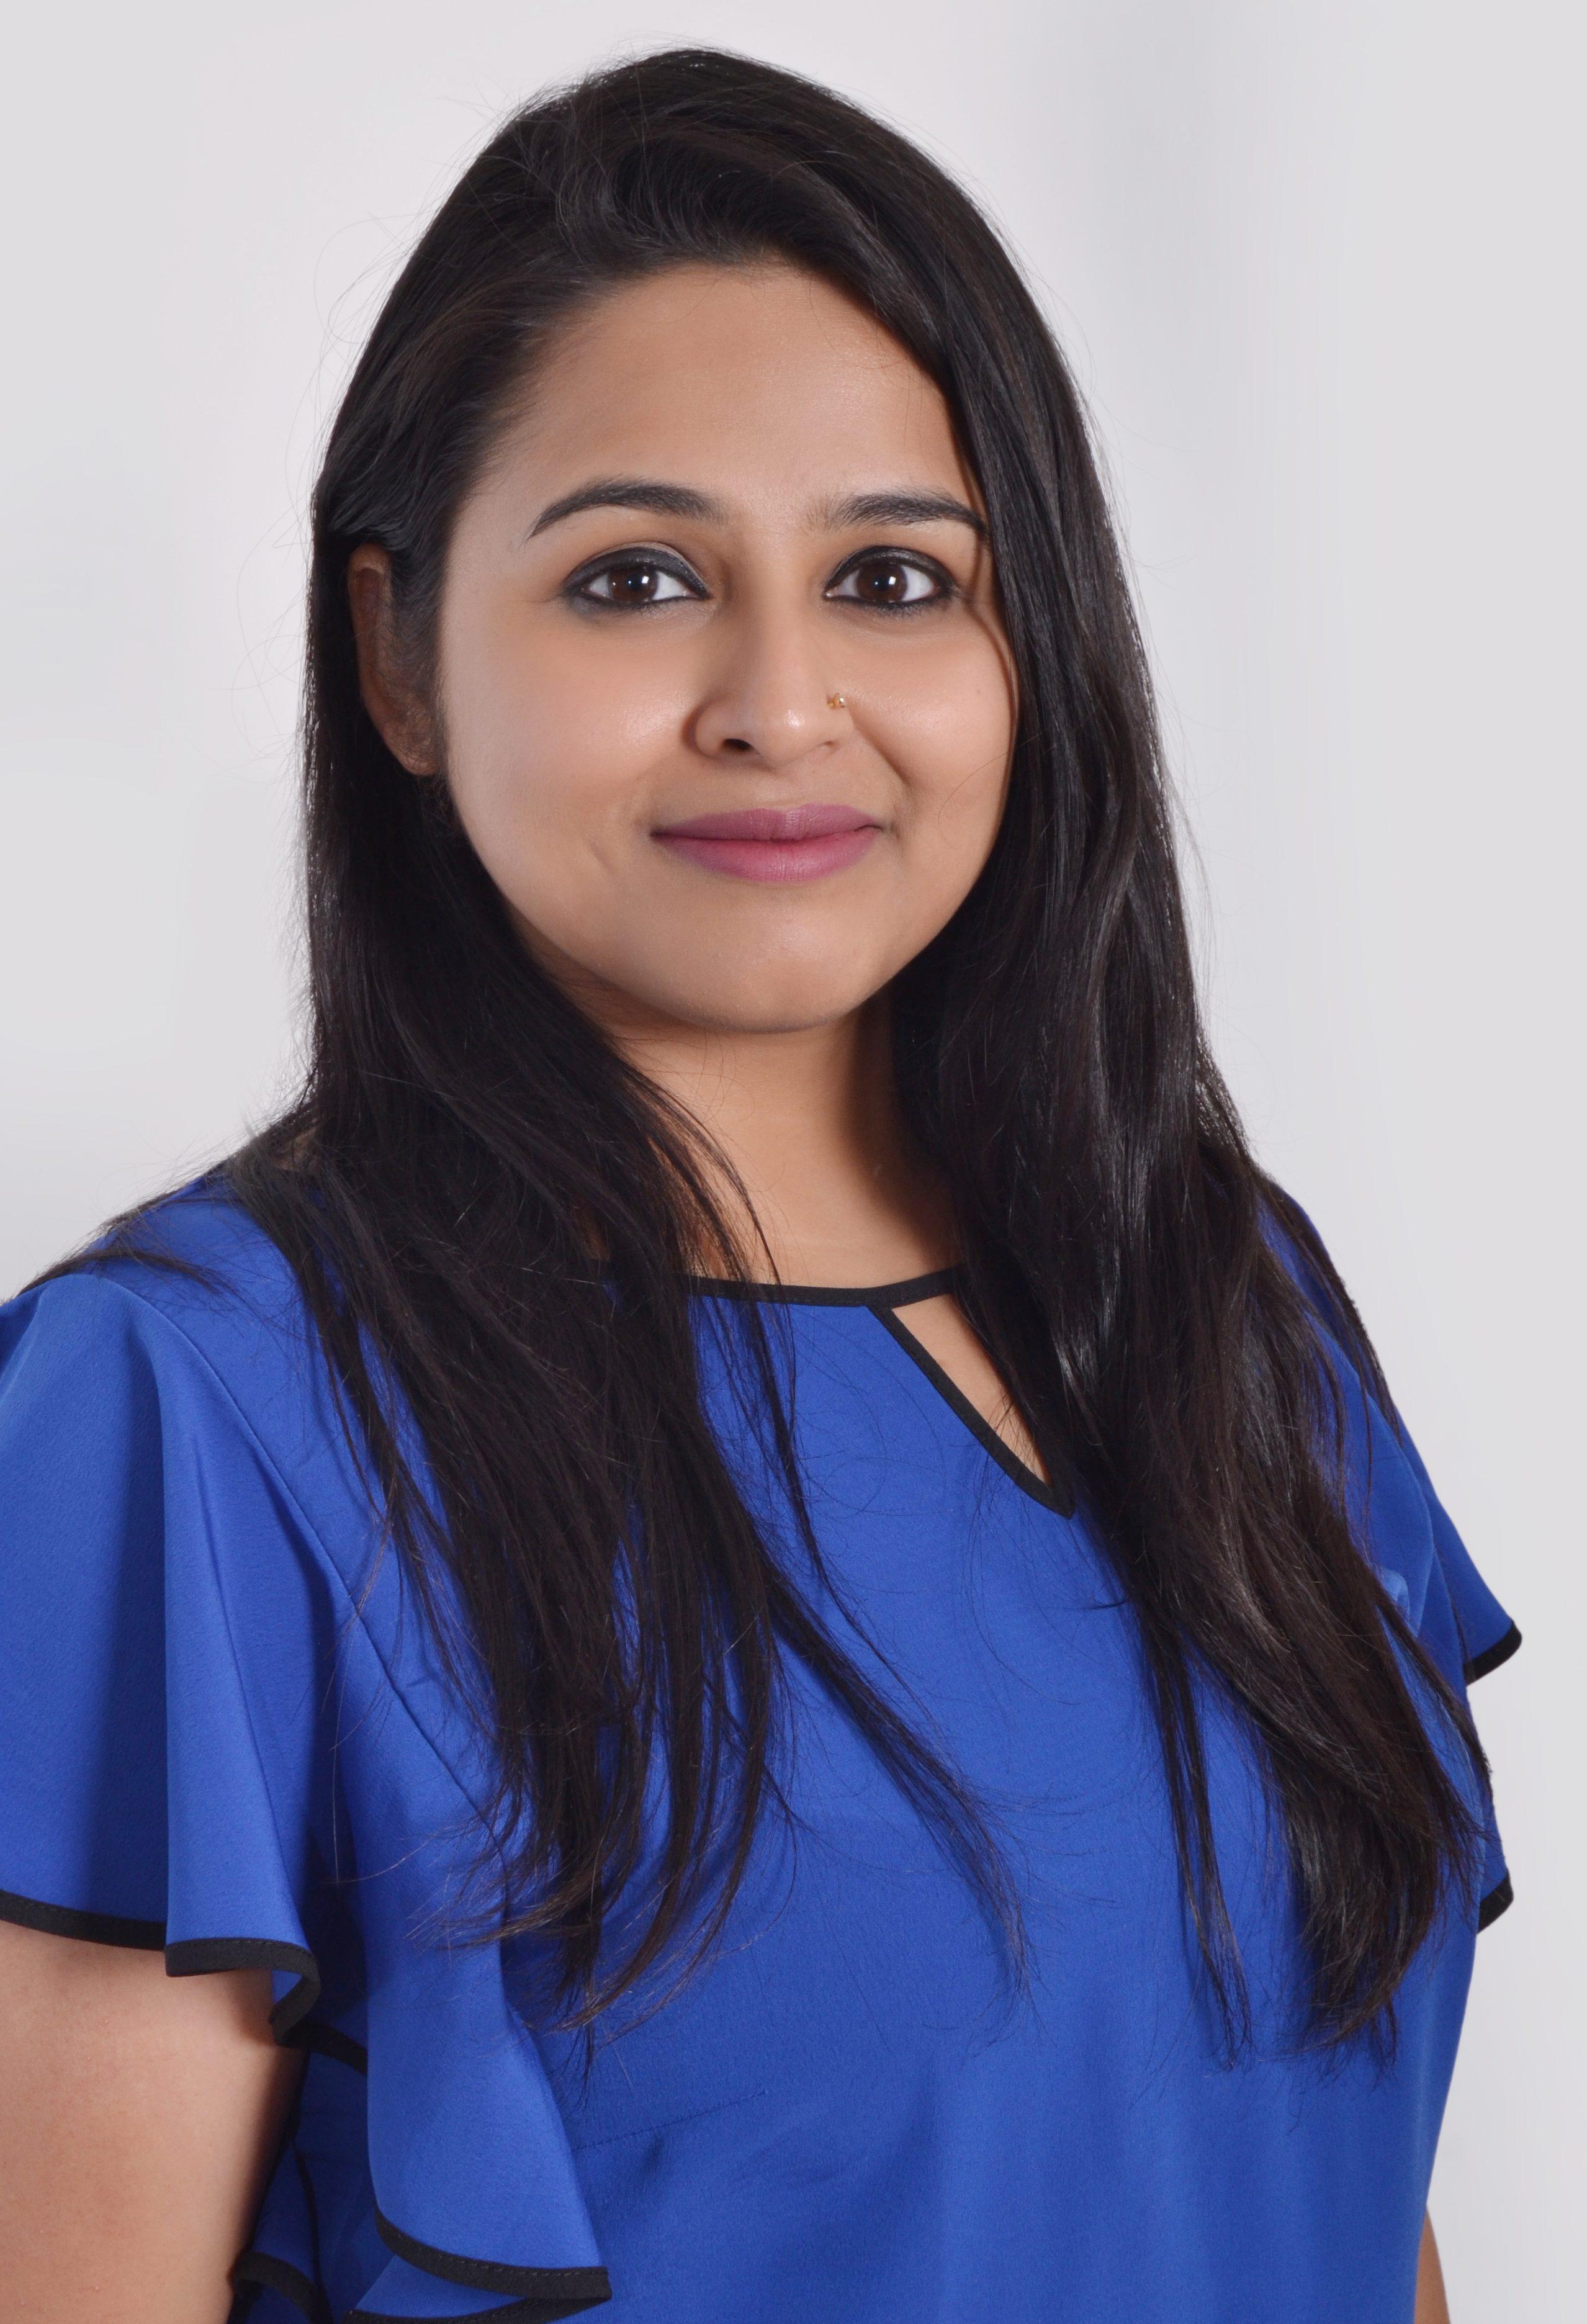 Vatsala Singh